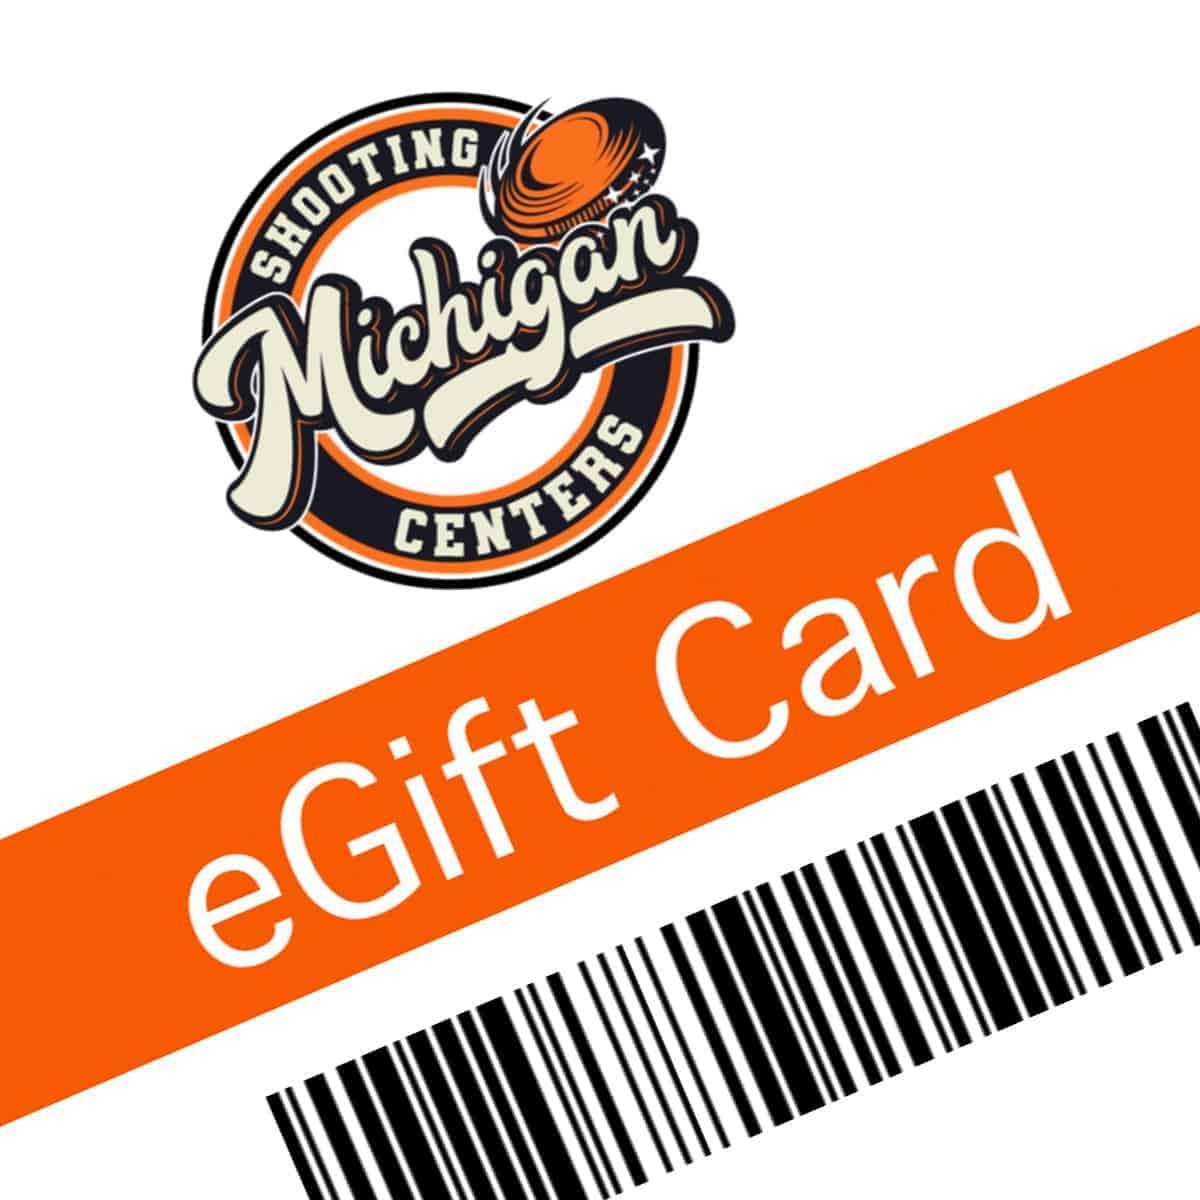 Michigan Shooting Centers Gift Card